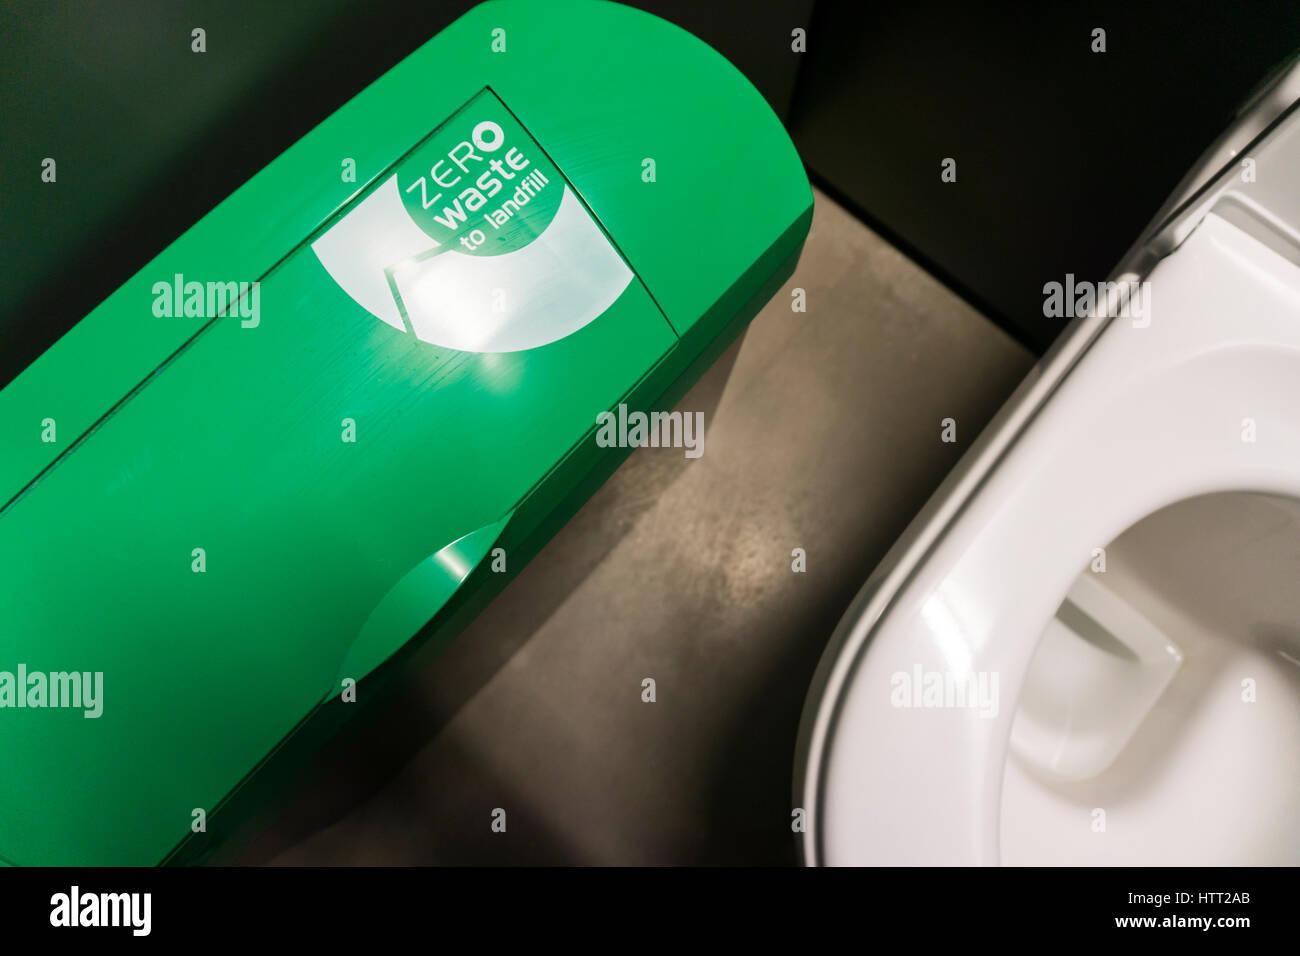 Zero Waste to Landfill sign on a waste bin in a public toilet, Brighton. - Stock Image